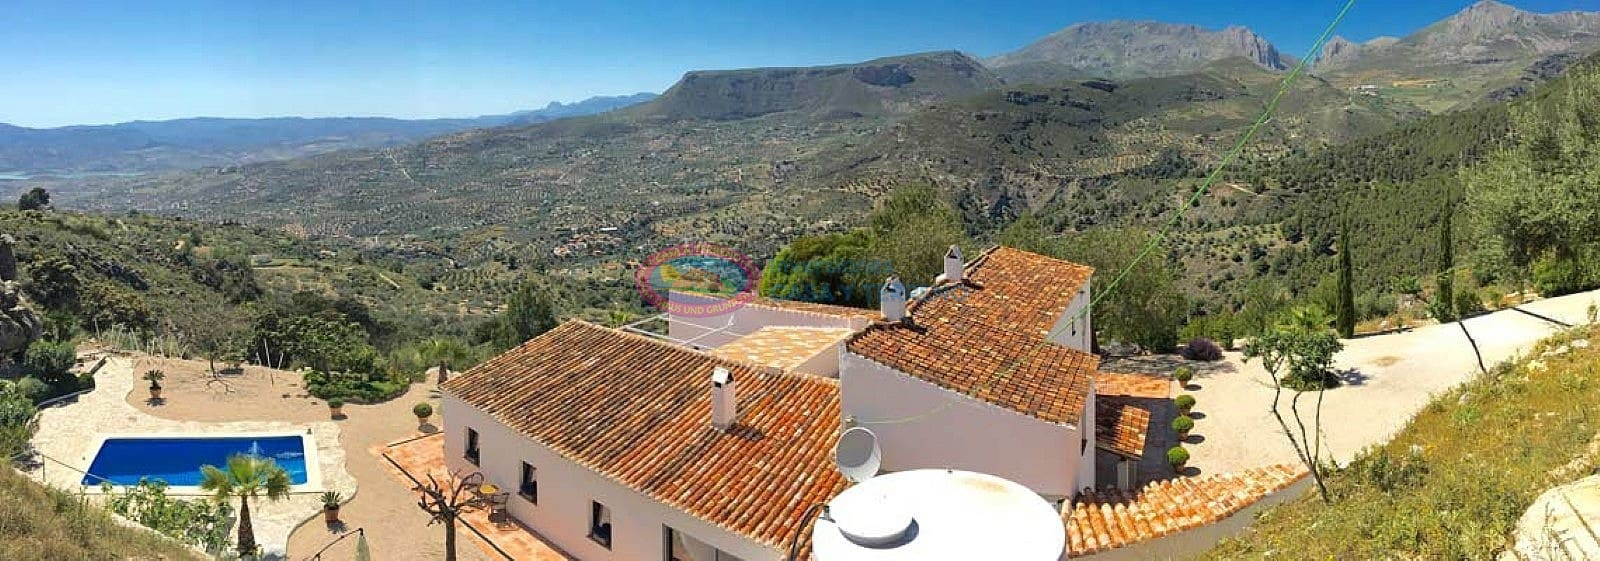 6 bedroom Villa for sale in Alcaucin with pool - € 795,000 (Ref: 4673356)